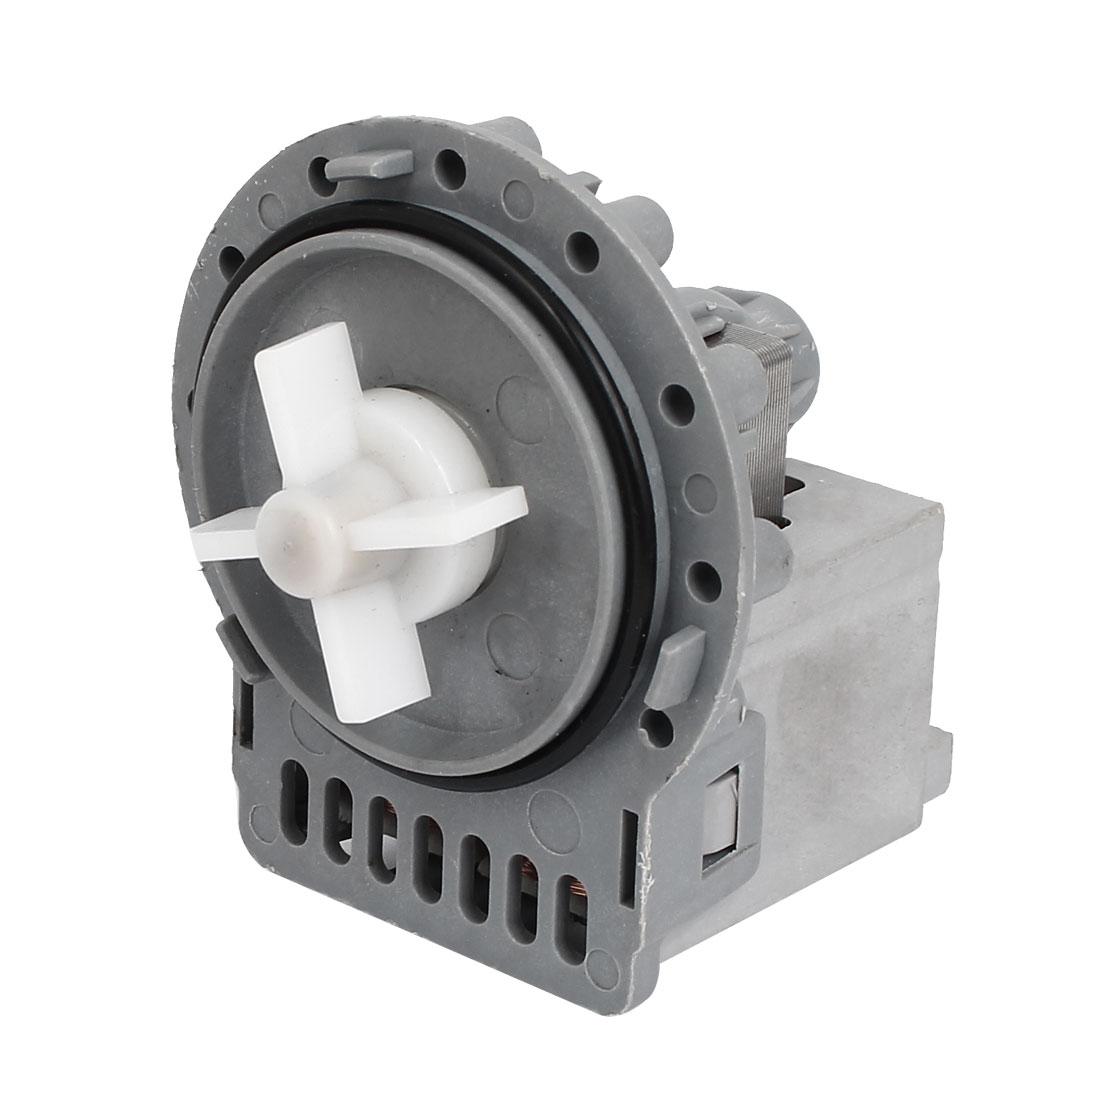 AC 220-240V Drain Pump Motor for Washing Machine Dishwasher Ice Maker